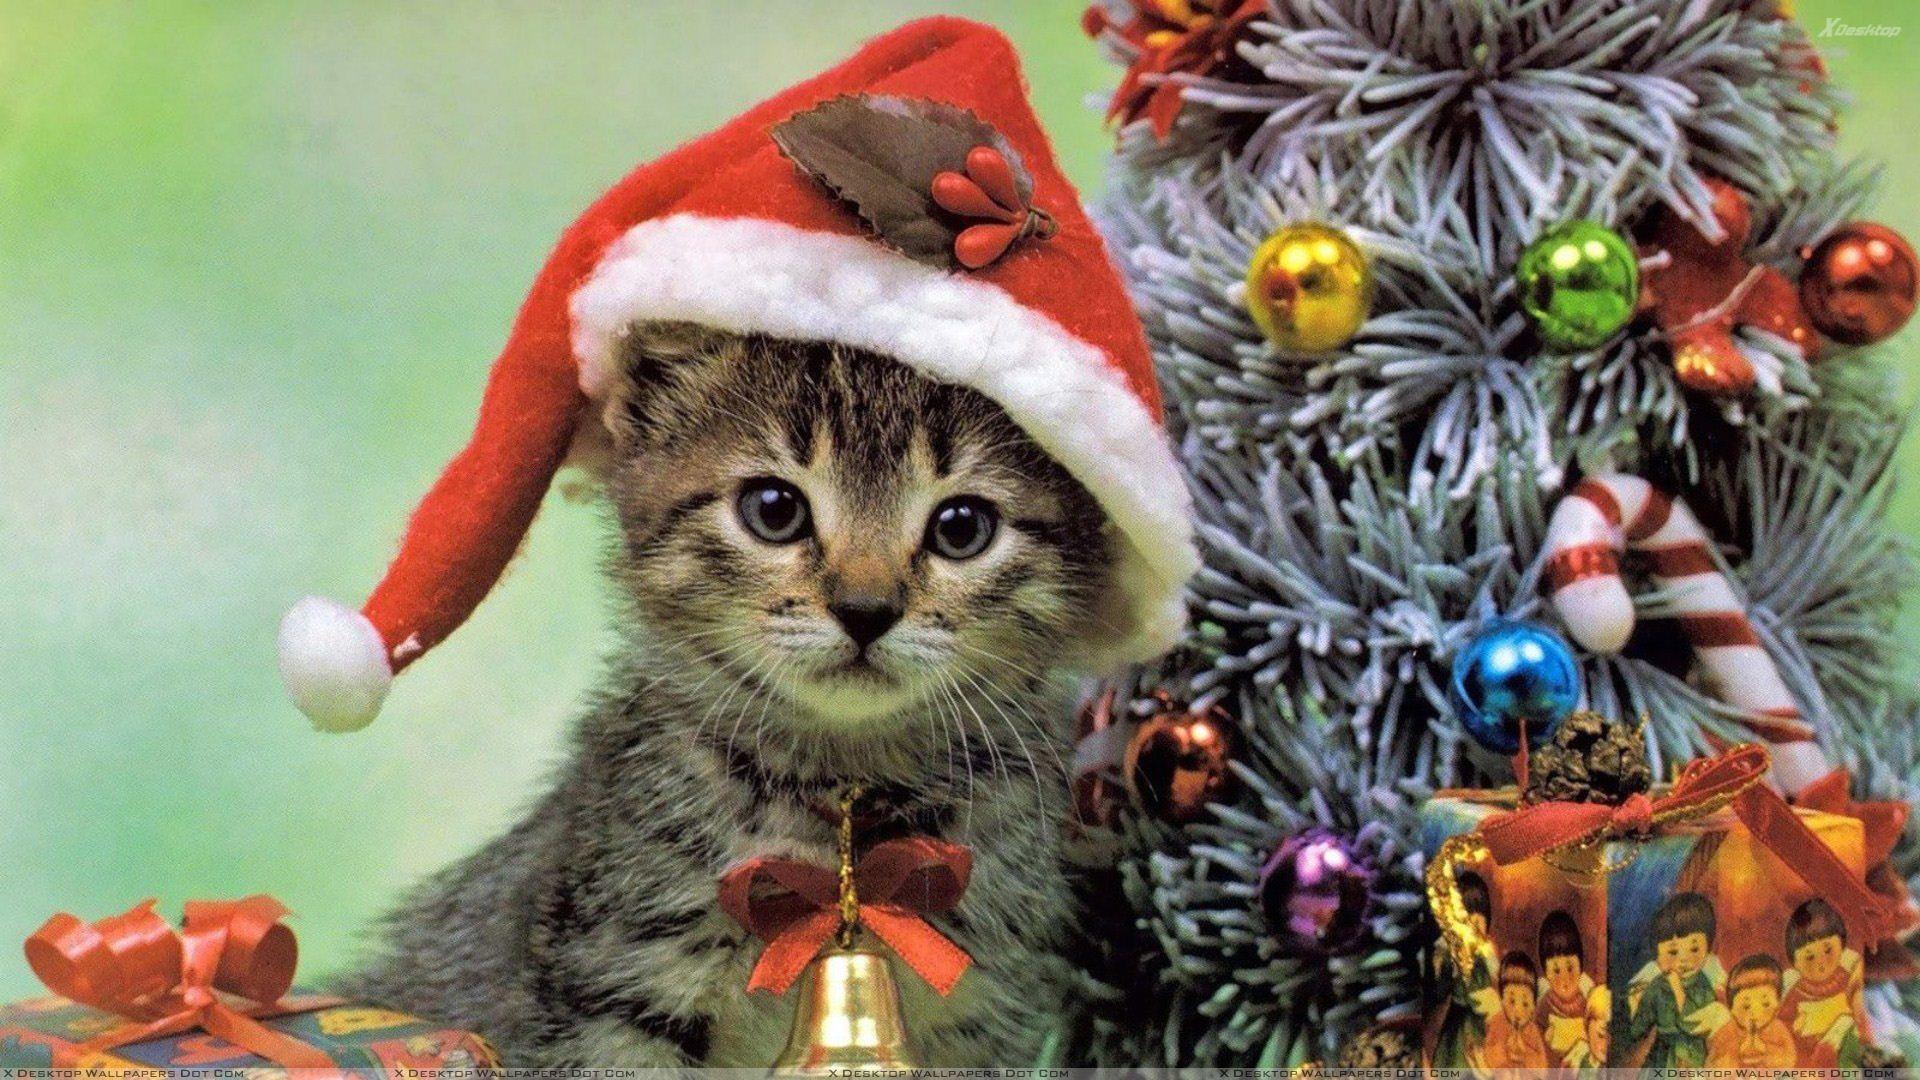 Computer Desktop Backgrounds Christmas Cats Wallpaper